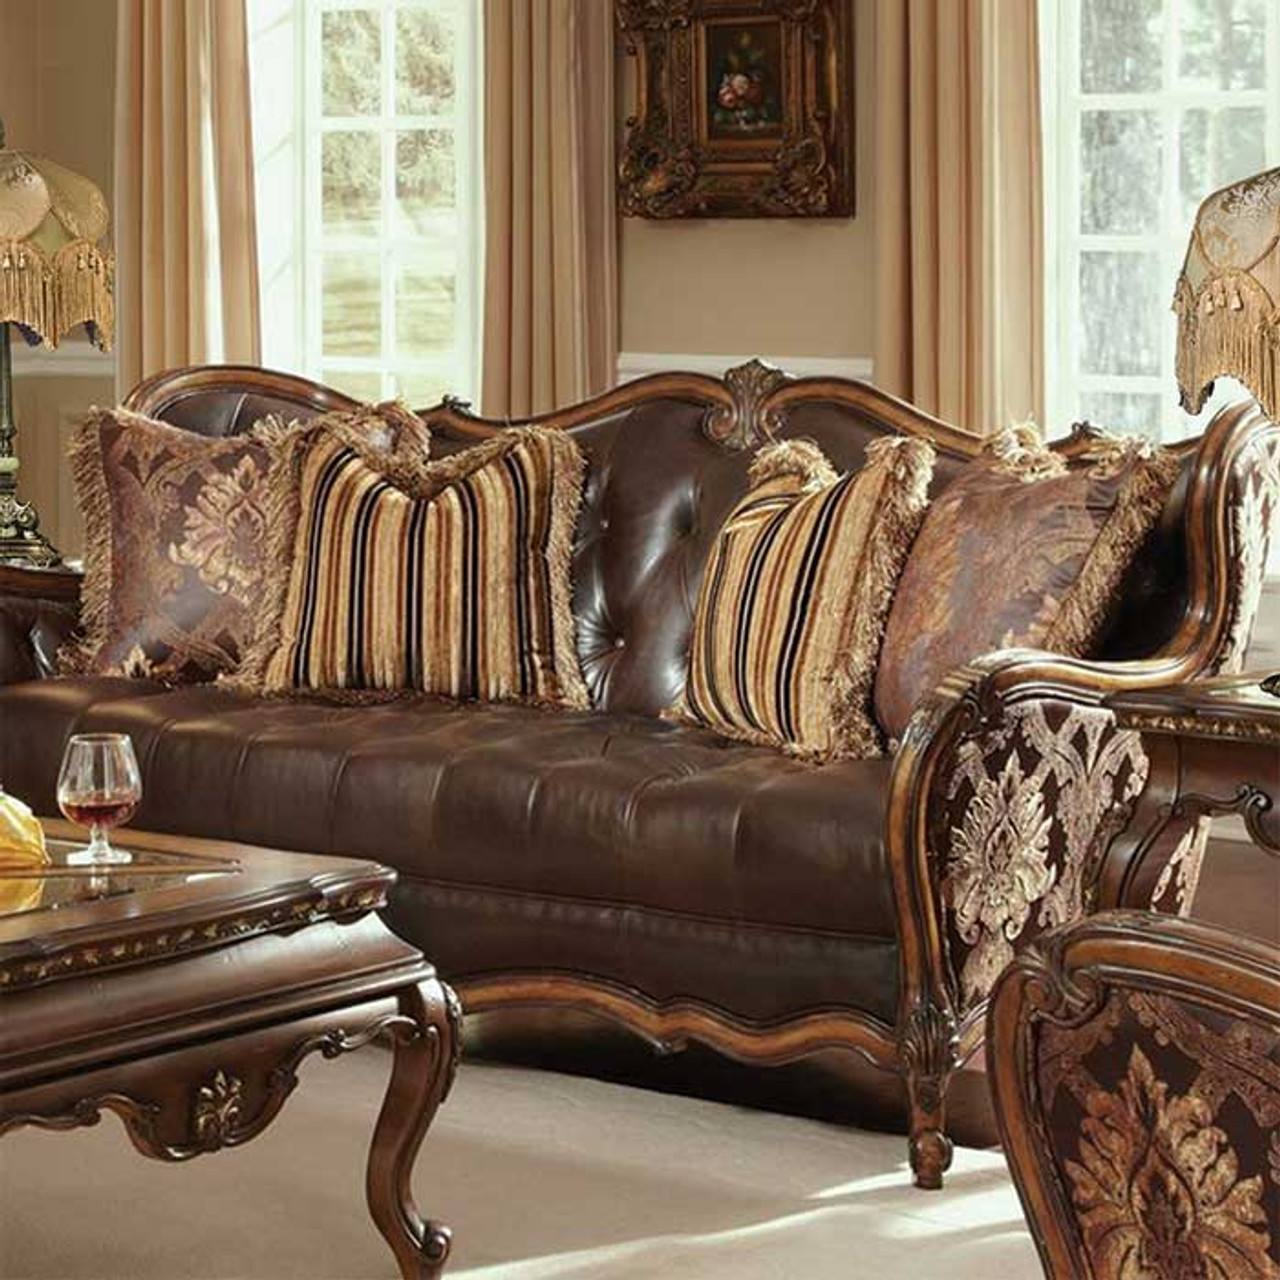 Caravelle Warm Walnut Leather Sofa